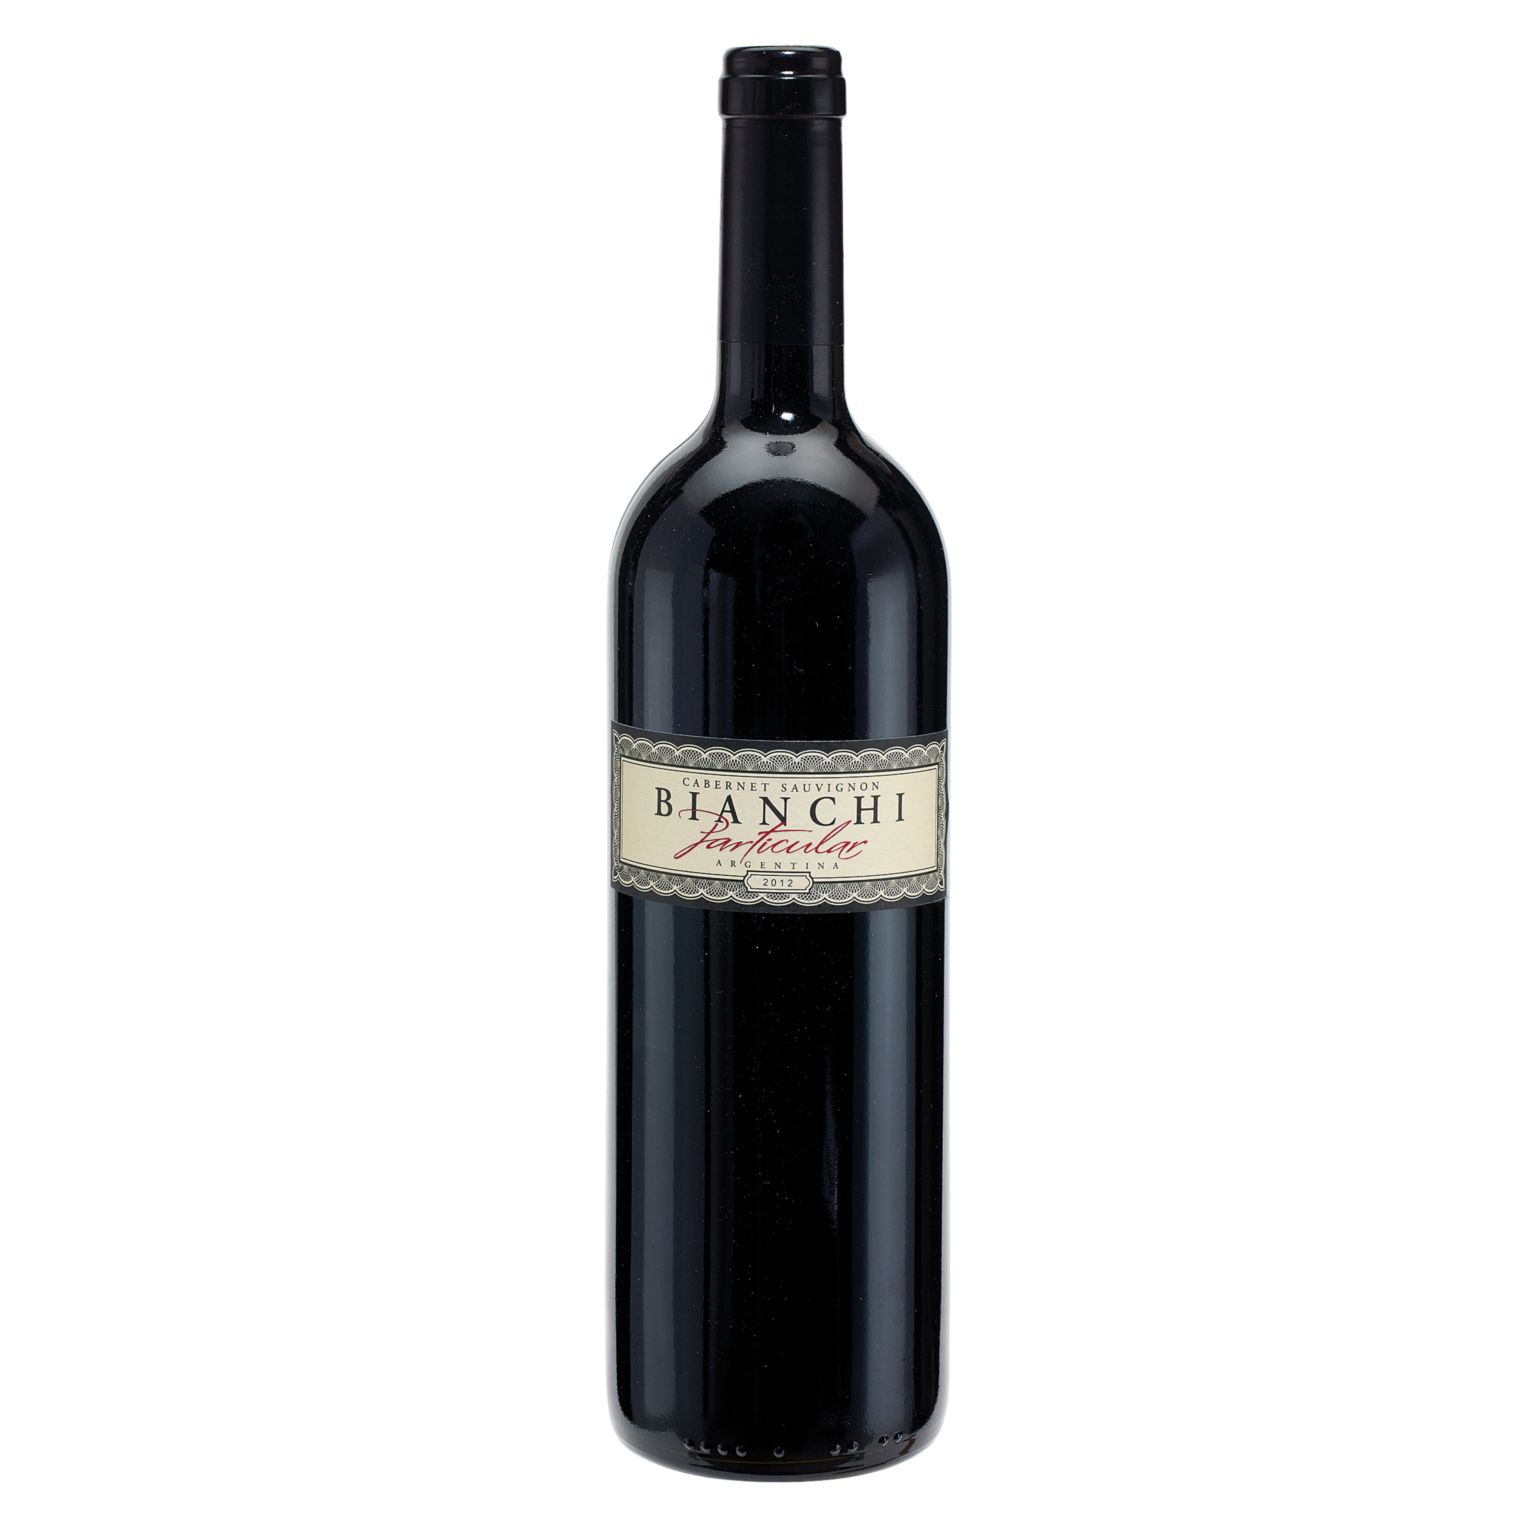 Red Wine, 2012 BIANCHI Particular – Cabernet Sauvignon